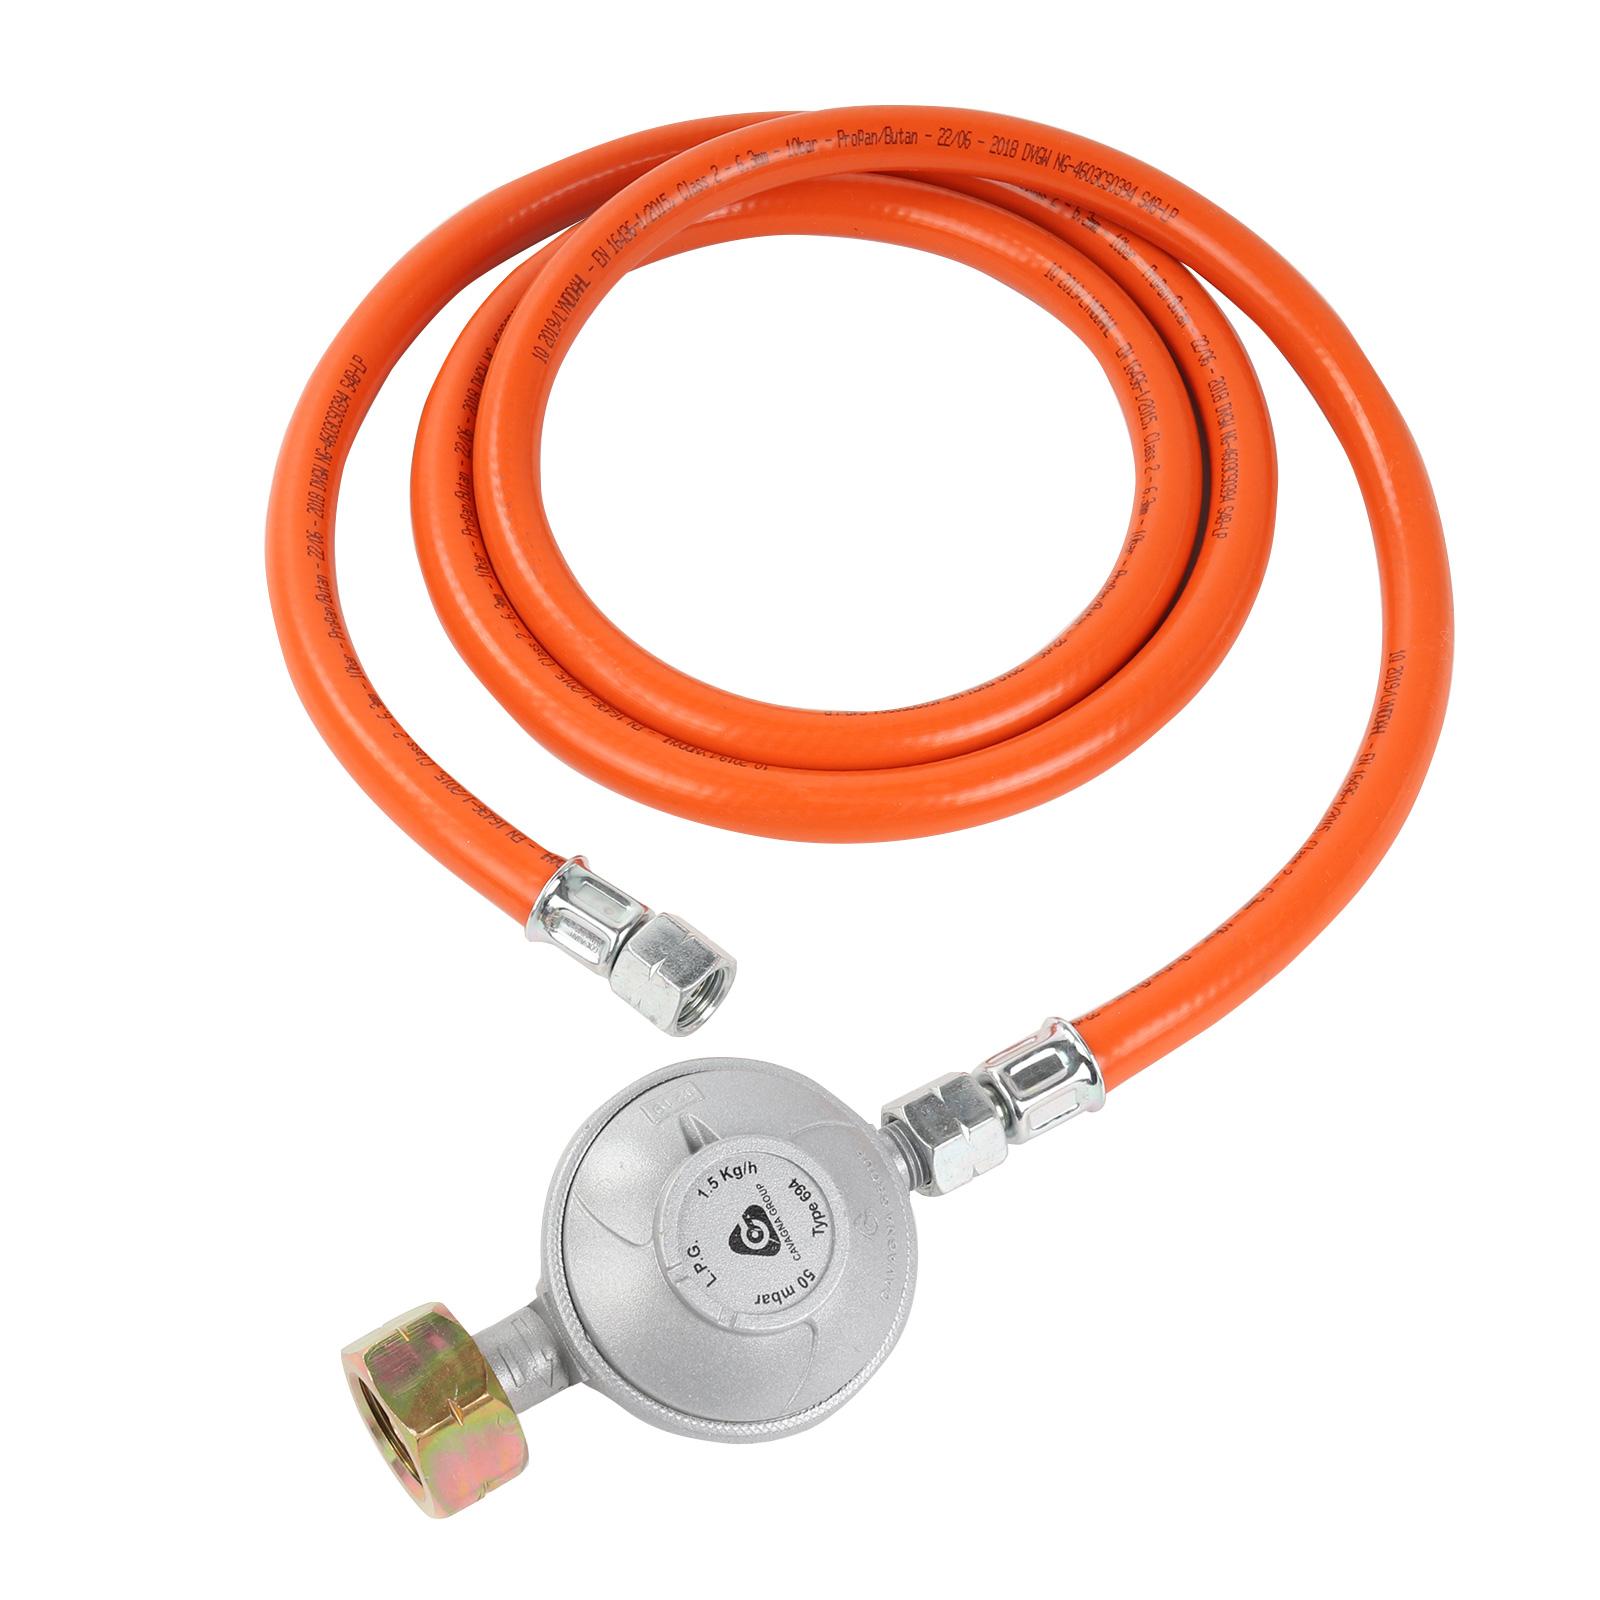 "Gasdruckregler 50mbar  1,5M Schlauch   Schraubanschlüssen 1/4"" links   G607 🔥"